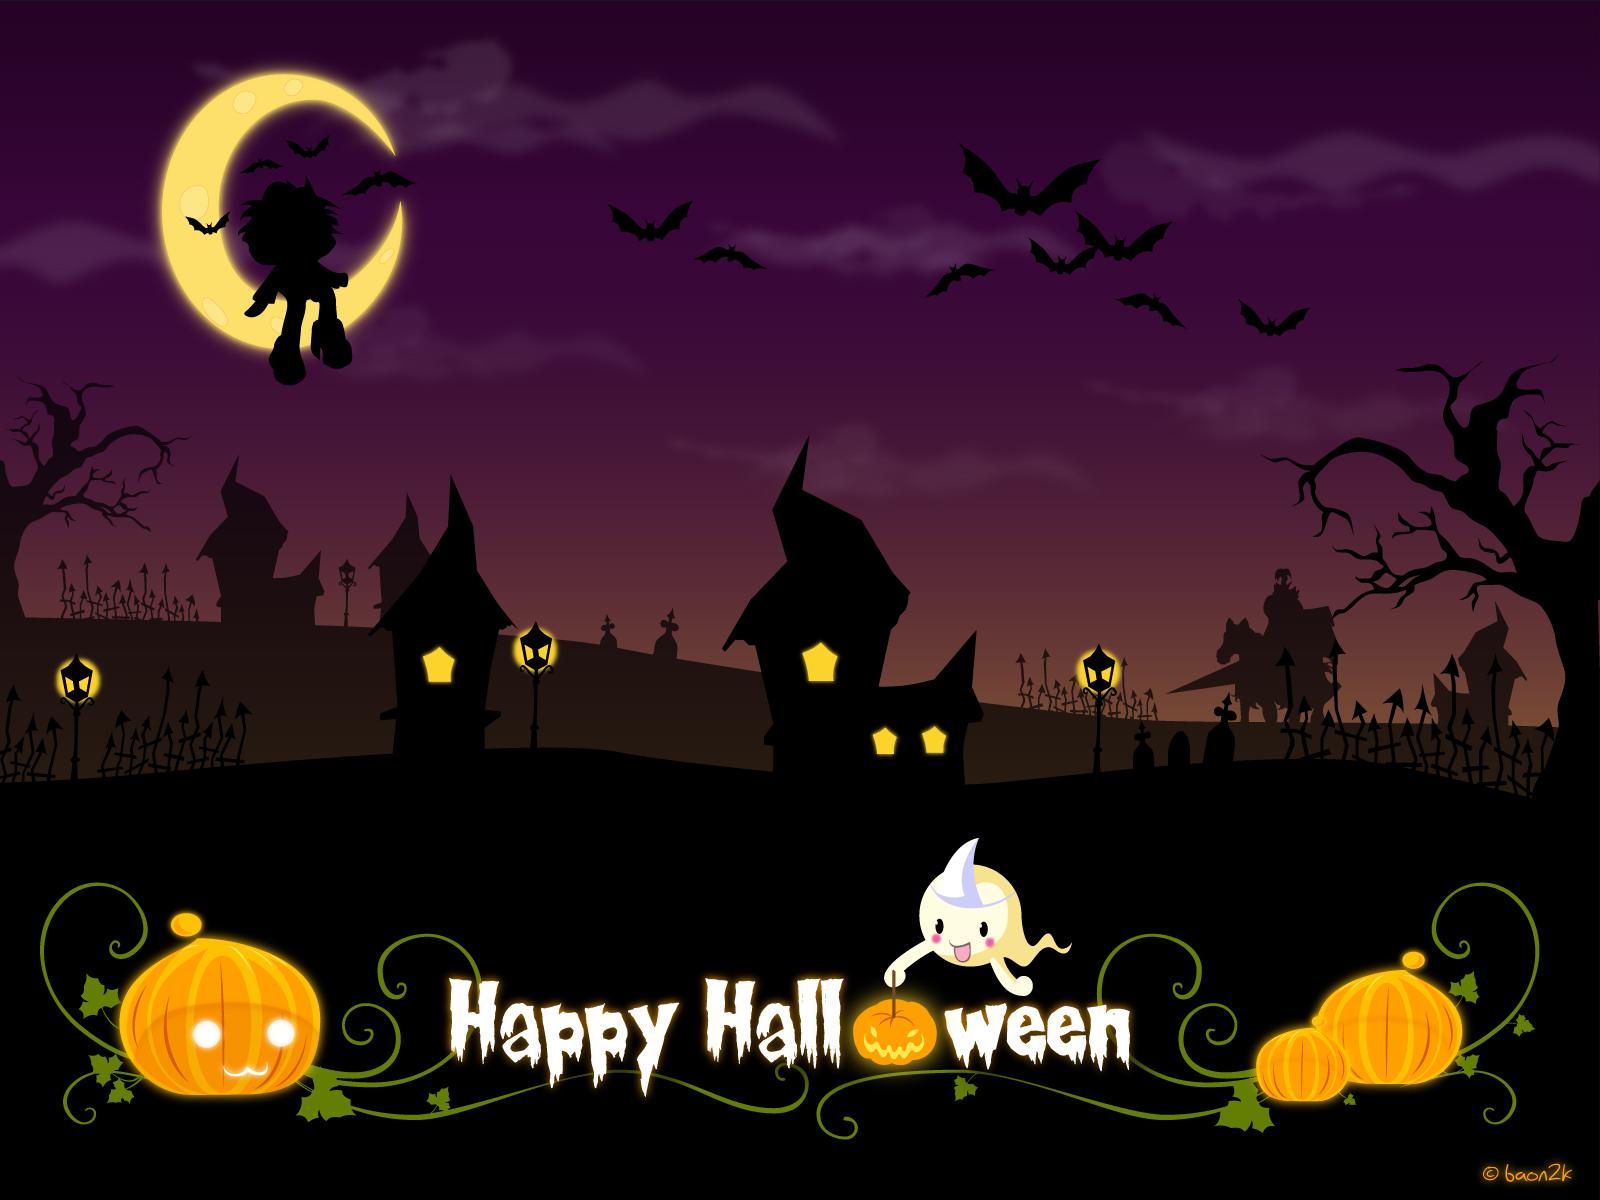 Happy Halloween! - Page 2 Happy_Halloween_by_baon2k